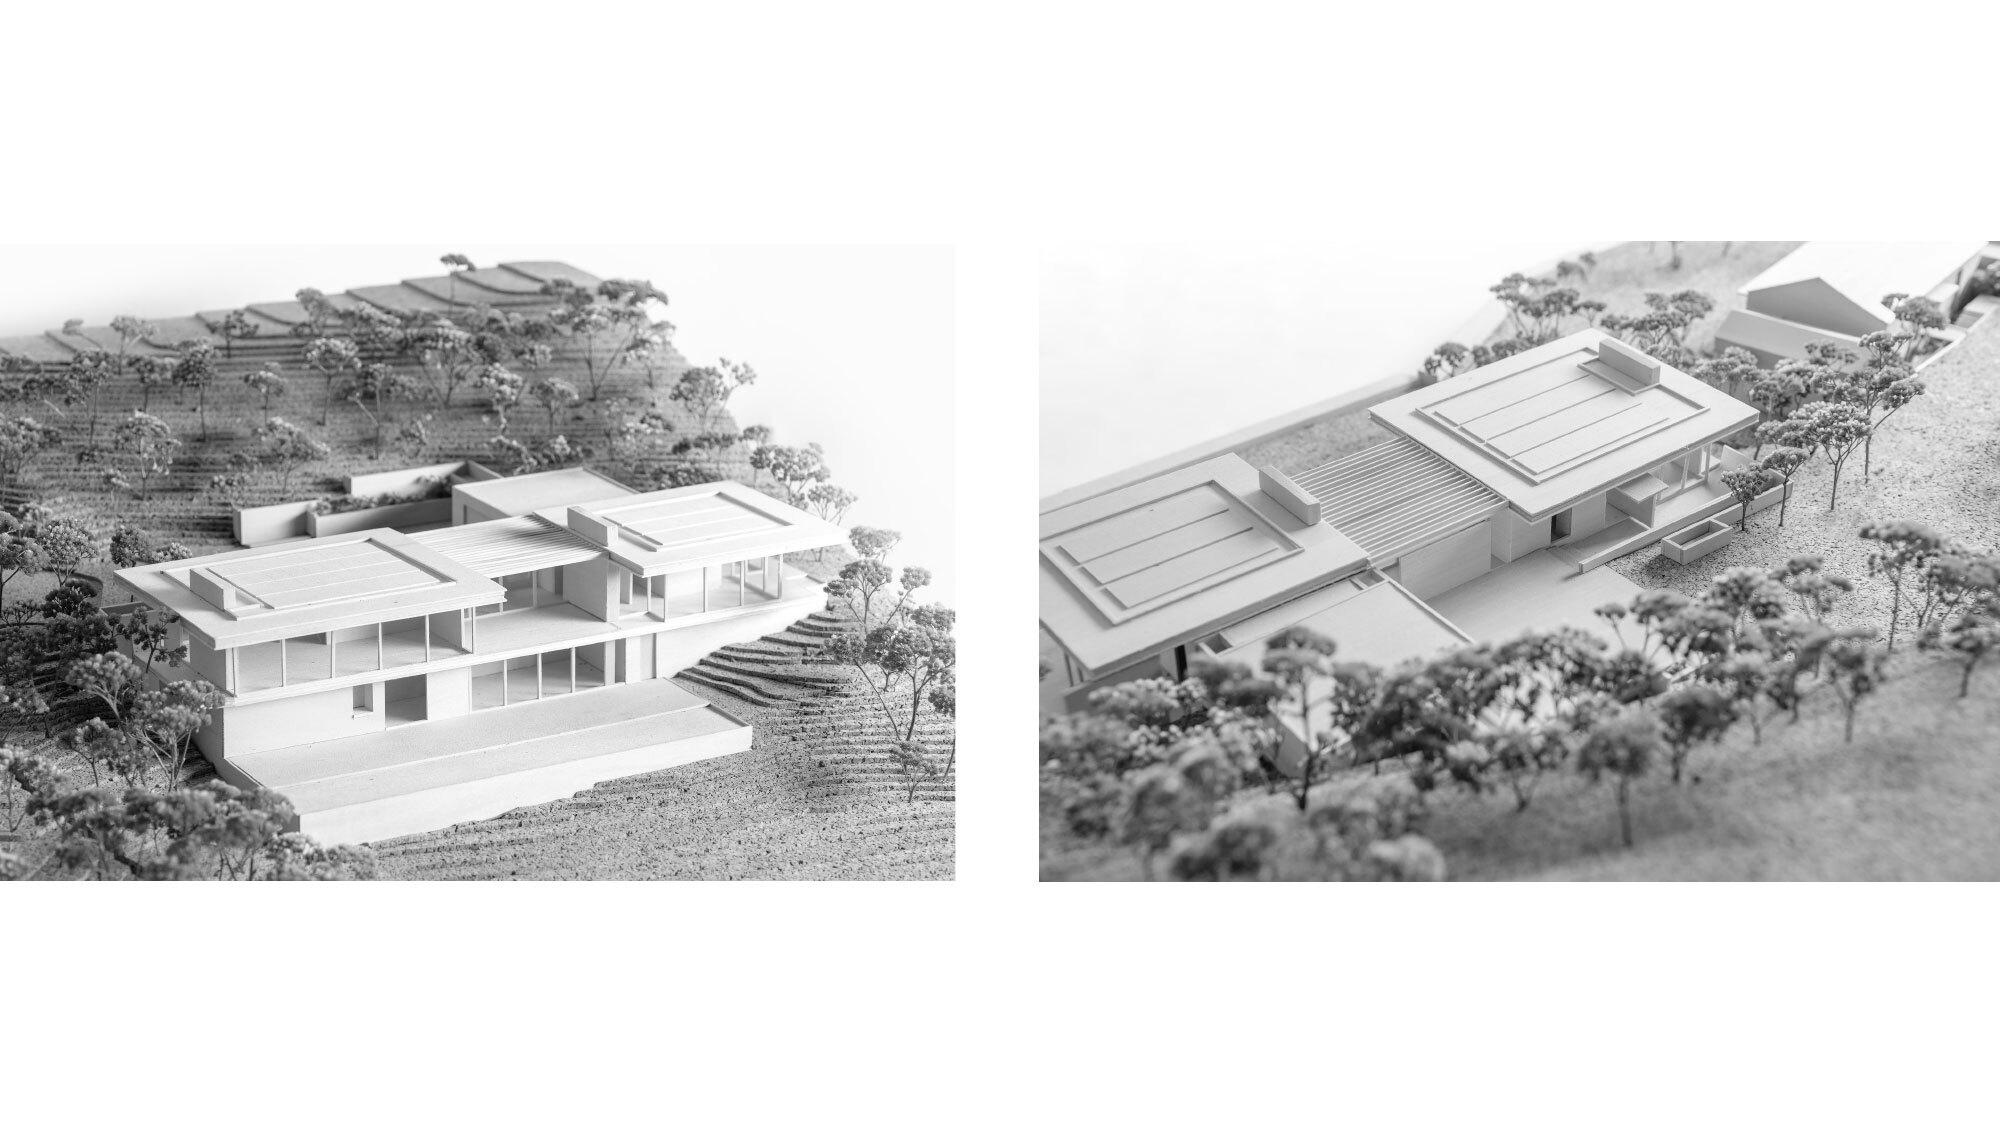 CCY Architects Pavilion model images 2